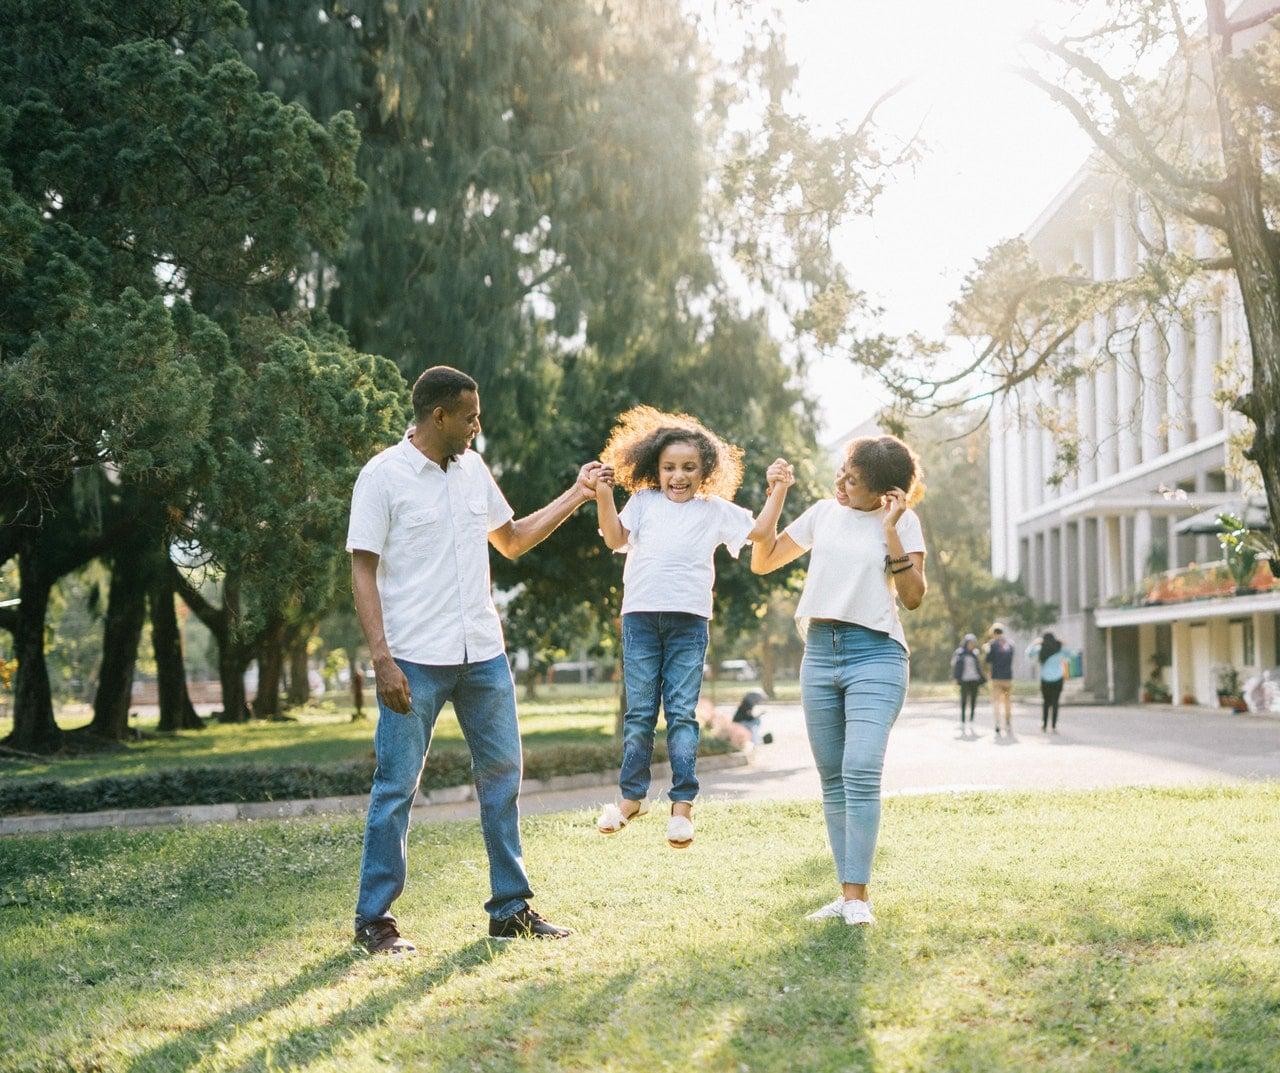 Family Time - Ten Reasons To Create An Estate Plan Now